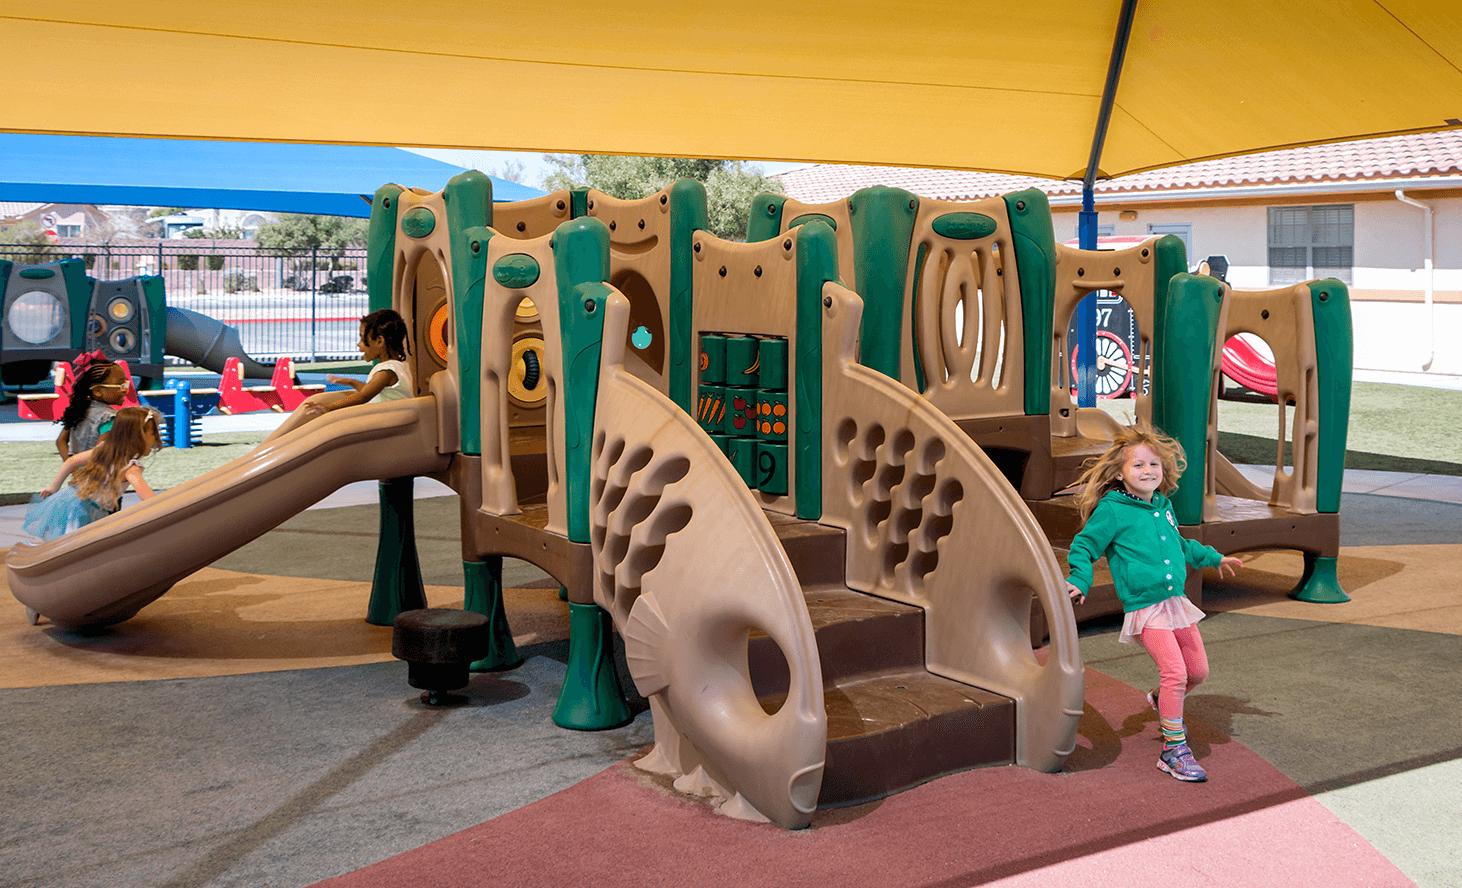 Playground Slide | Challenger School - Los Prados | Private School In Las Vegas, Nevada